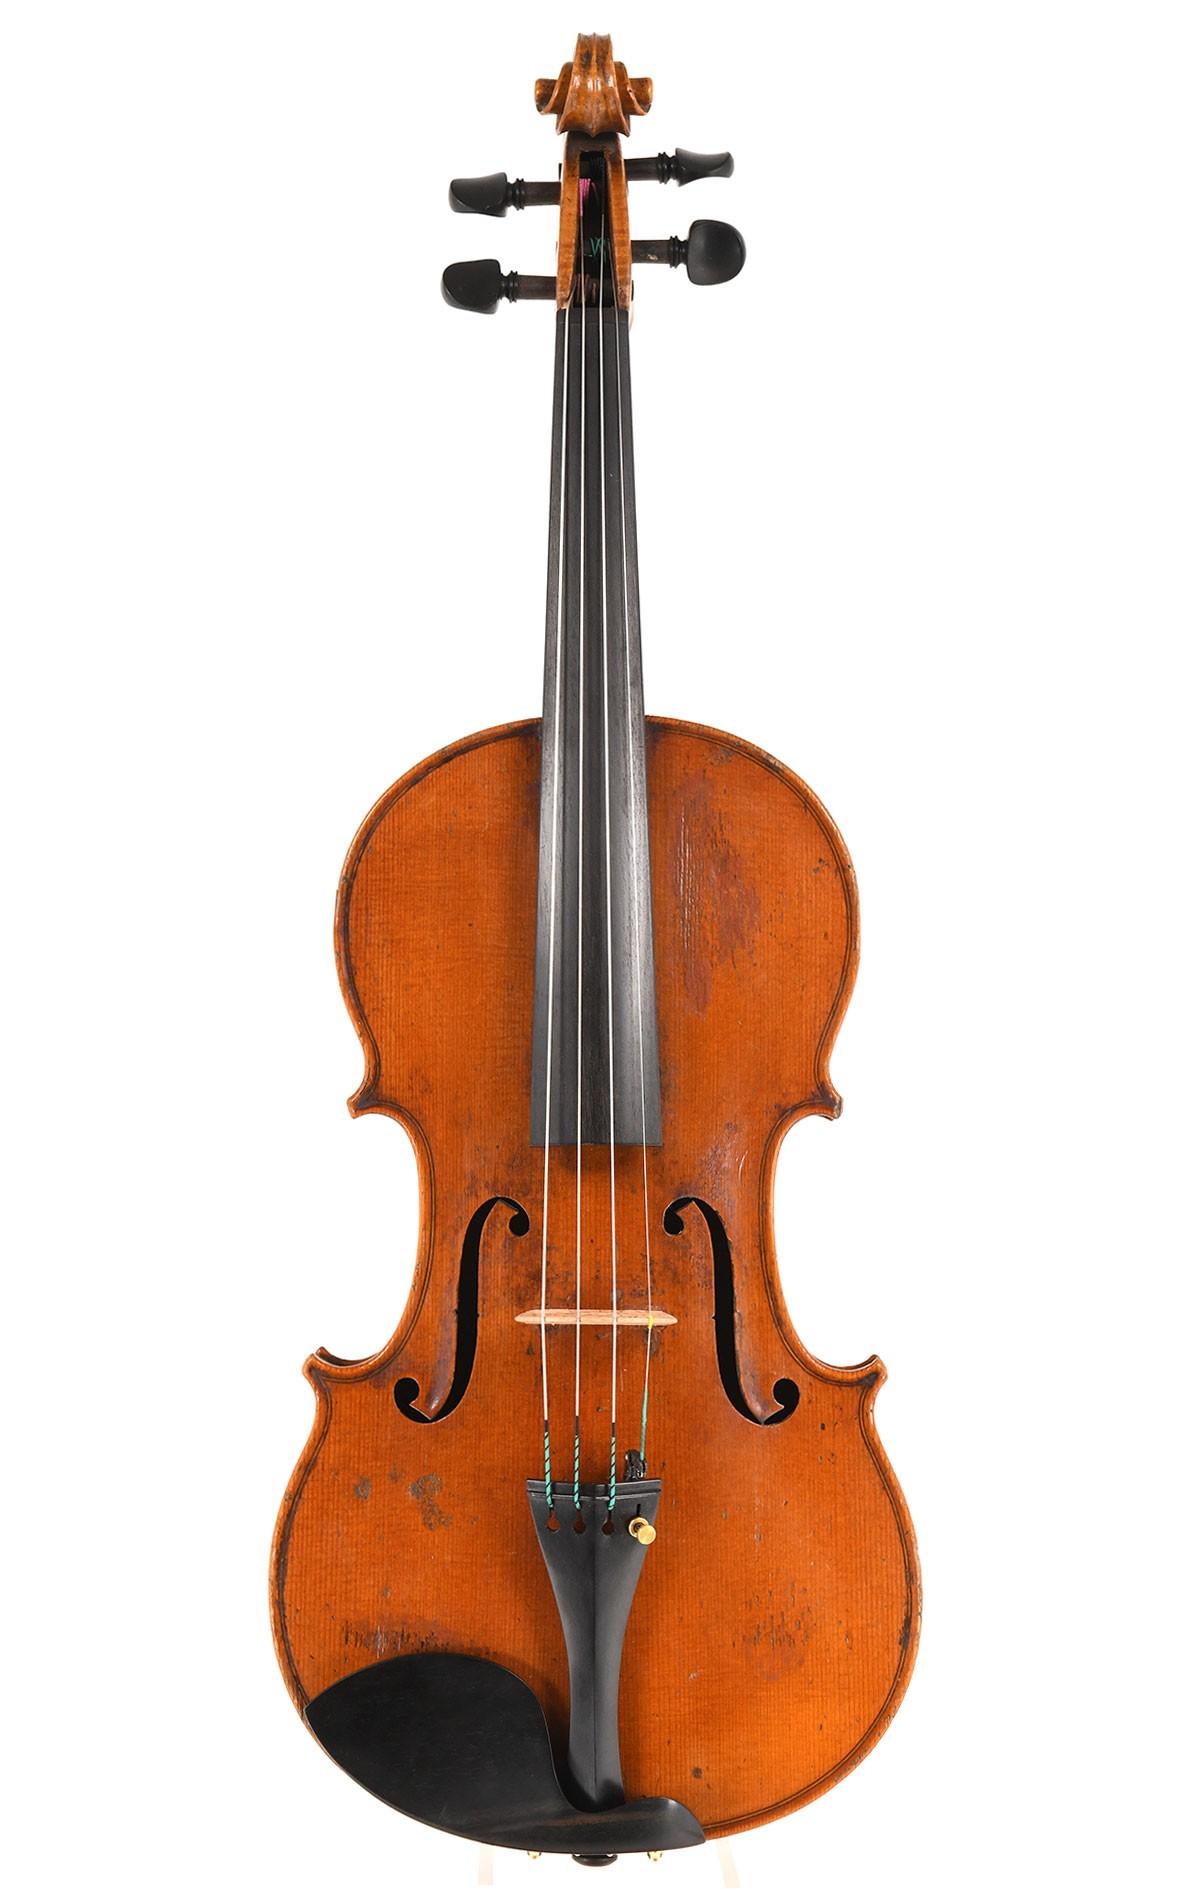 Interessante historische Violine von Grandjon Pere, Mirecourt